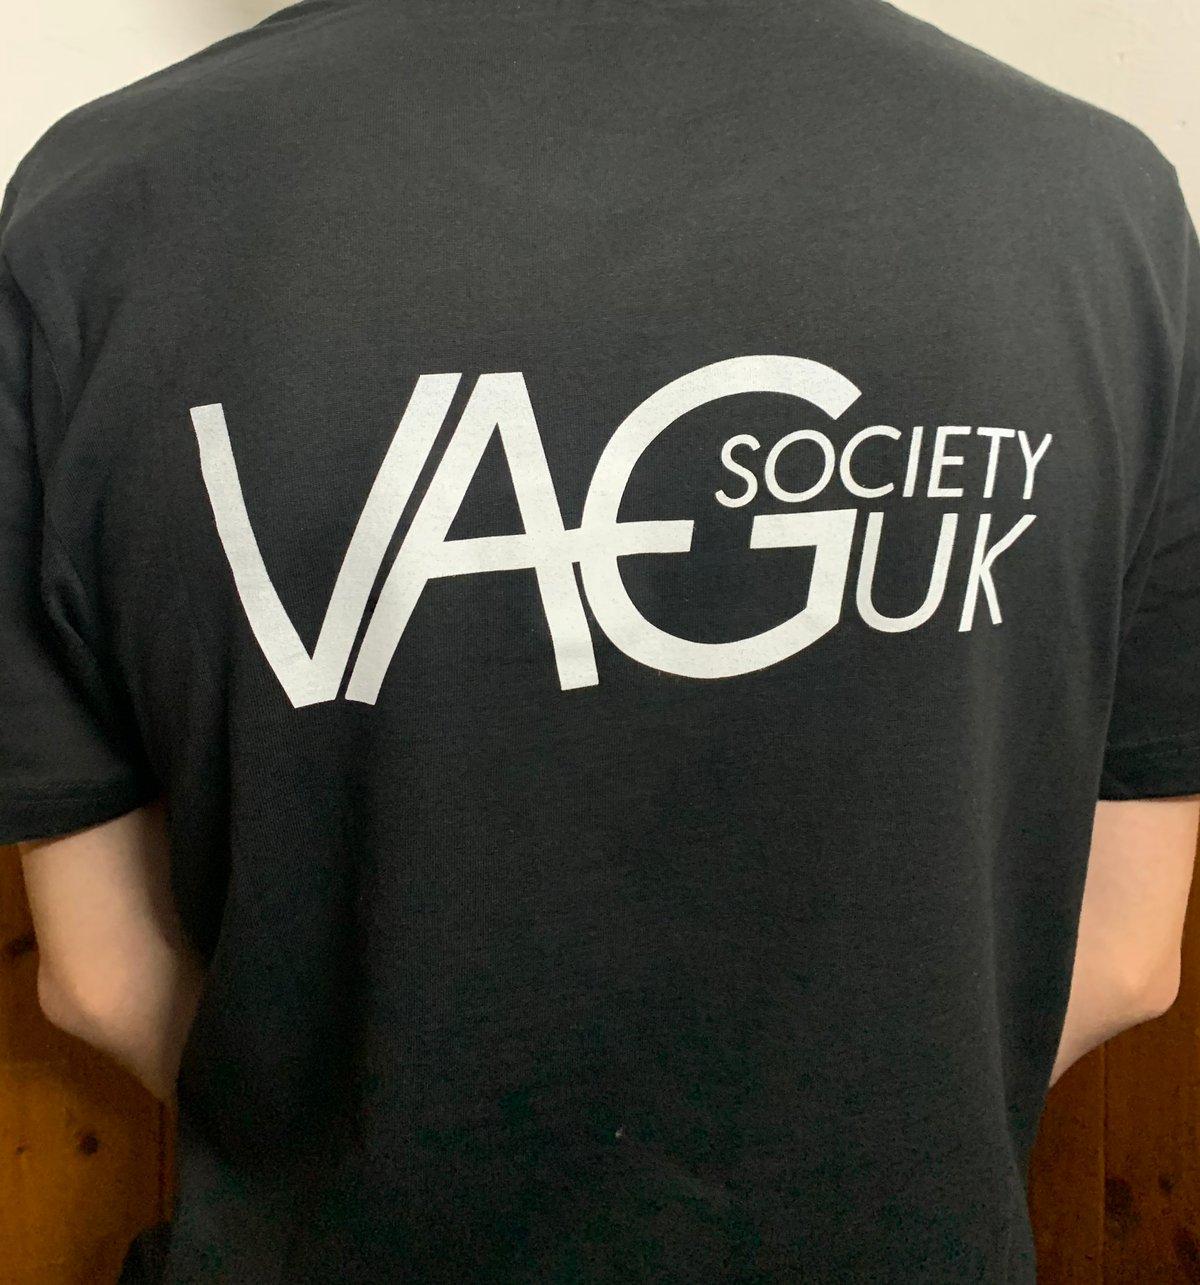 Image of VAGSocietyUK 'VSUK' Black T-Shirt